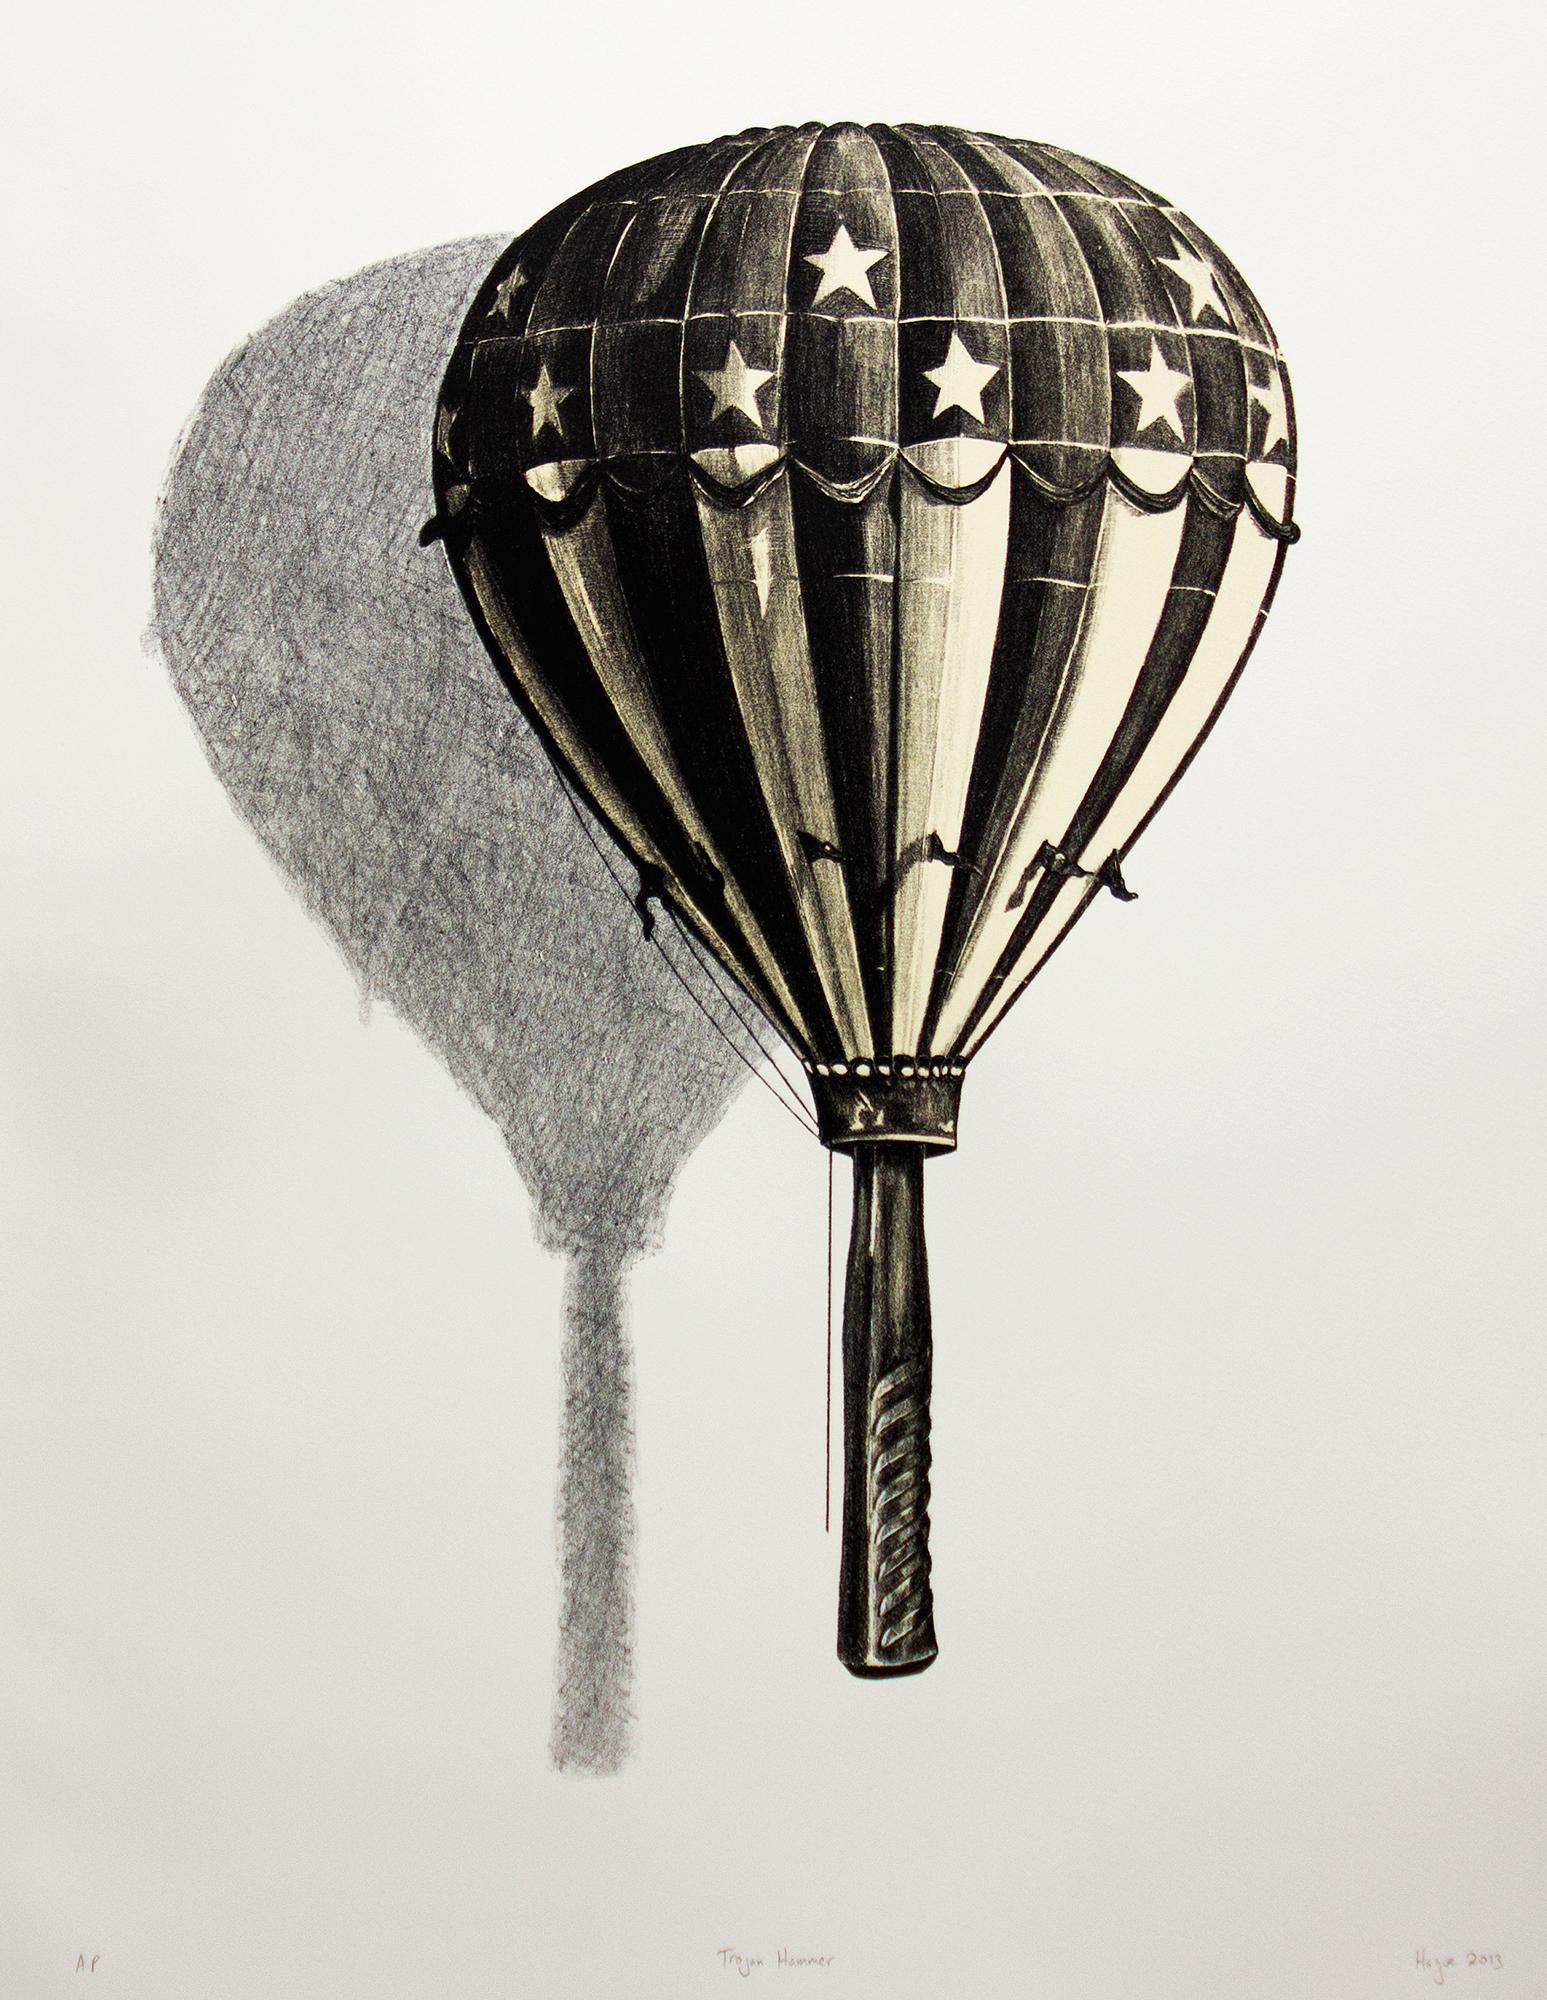 Trojan Hammer (Balloon). 2013